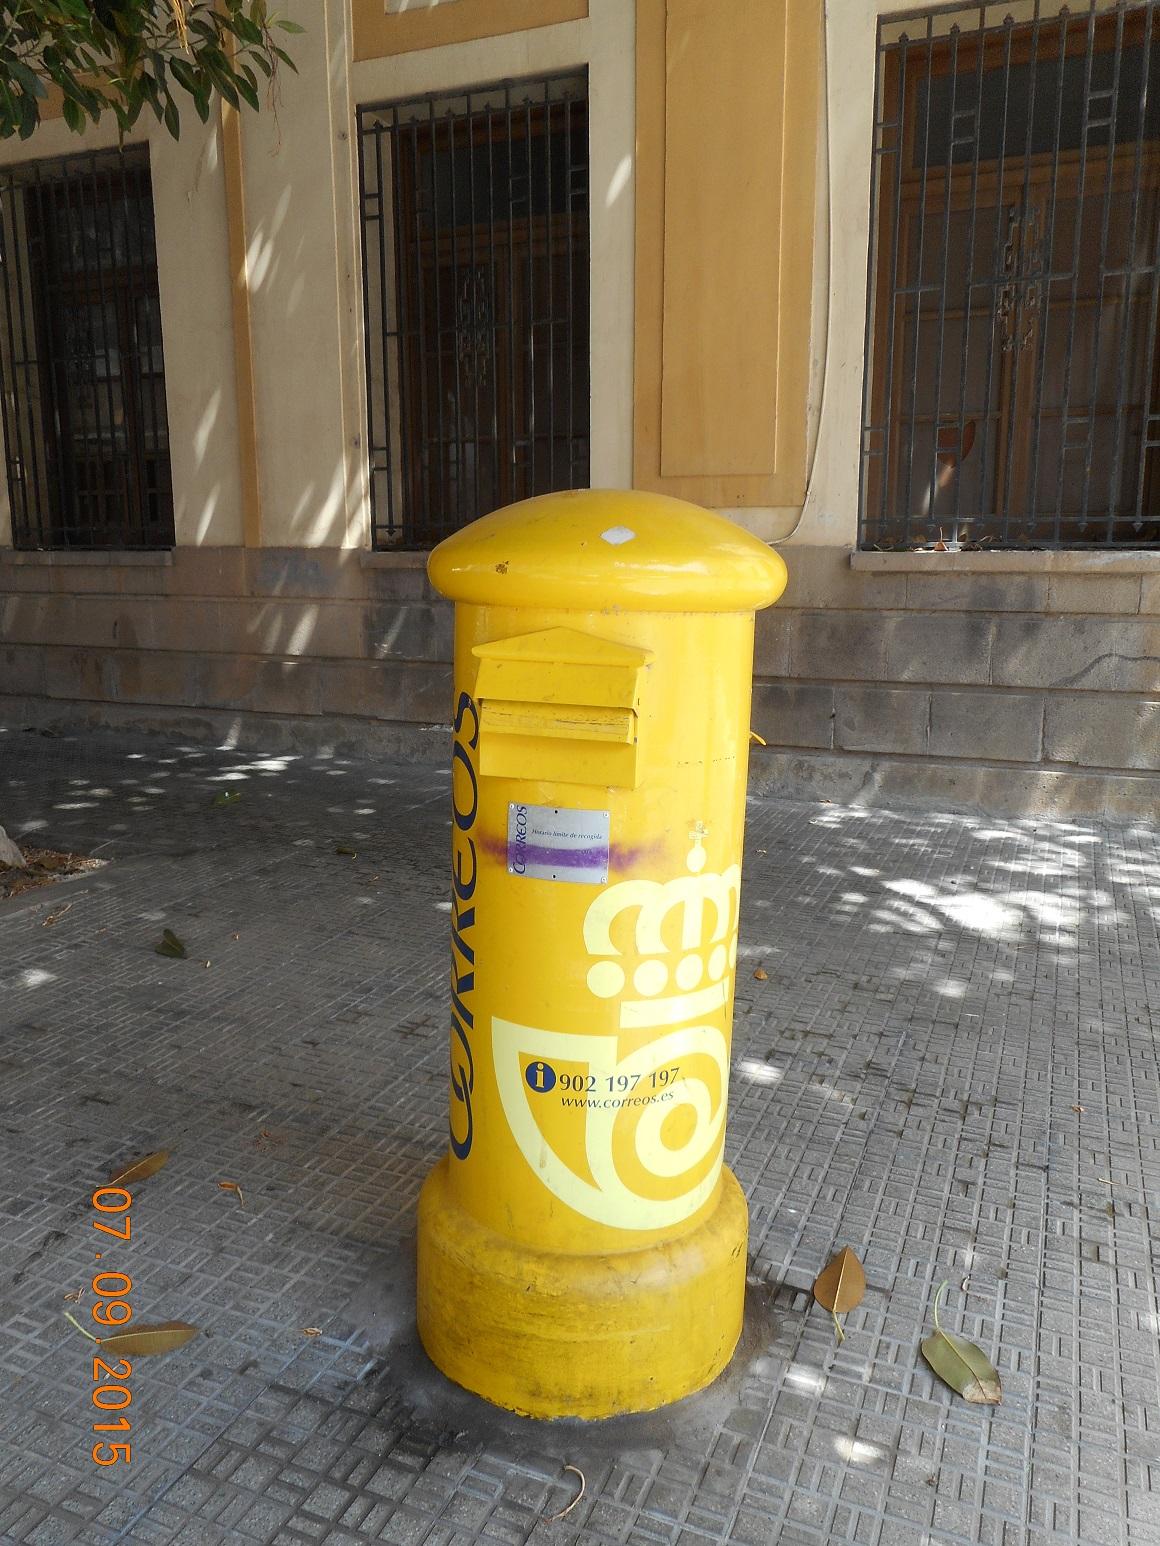 Buzones de correos madrid buzones buzones with buzones de correos madrid good buzones de - Buzones ortega ...